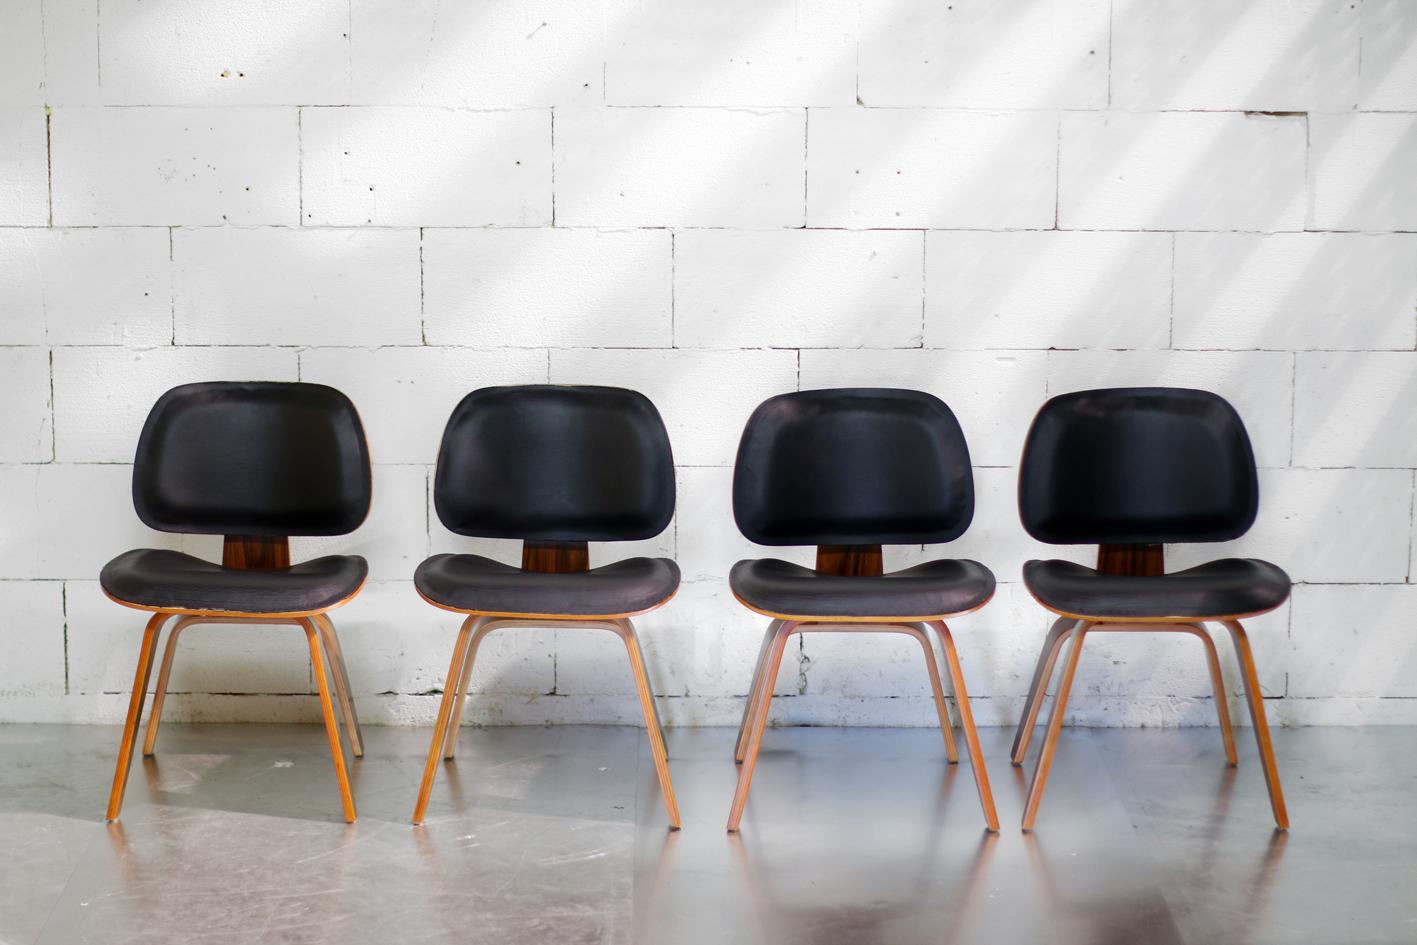 Plywood en Zwart Skai Eames Lookalike design stoelen u2013 Dehuiszwaluw